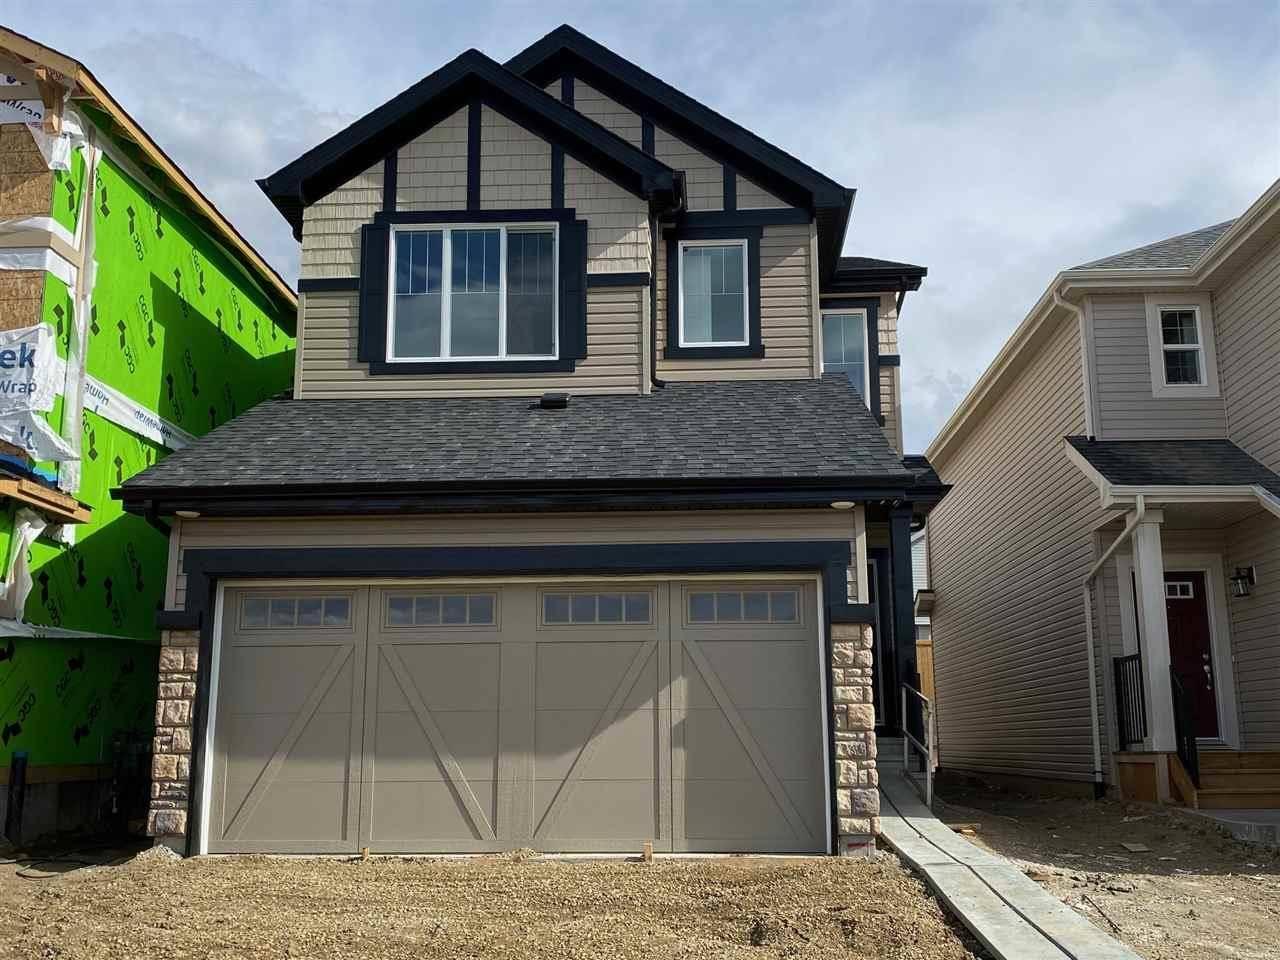 House for sale at 4244 Chichak Cs Sw Edmonton Alberta - MLS: E4189756